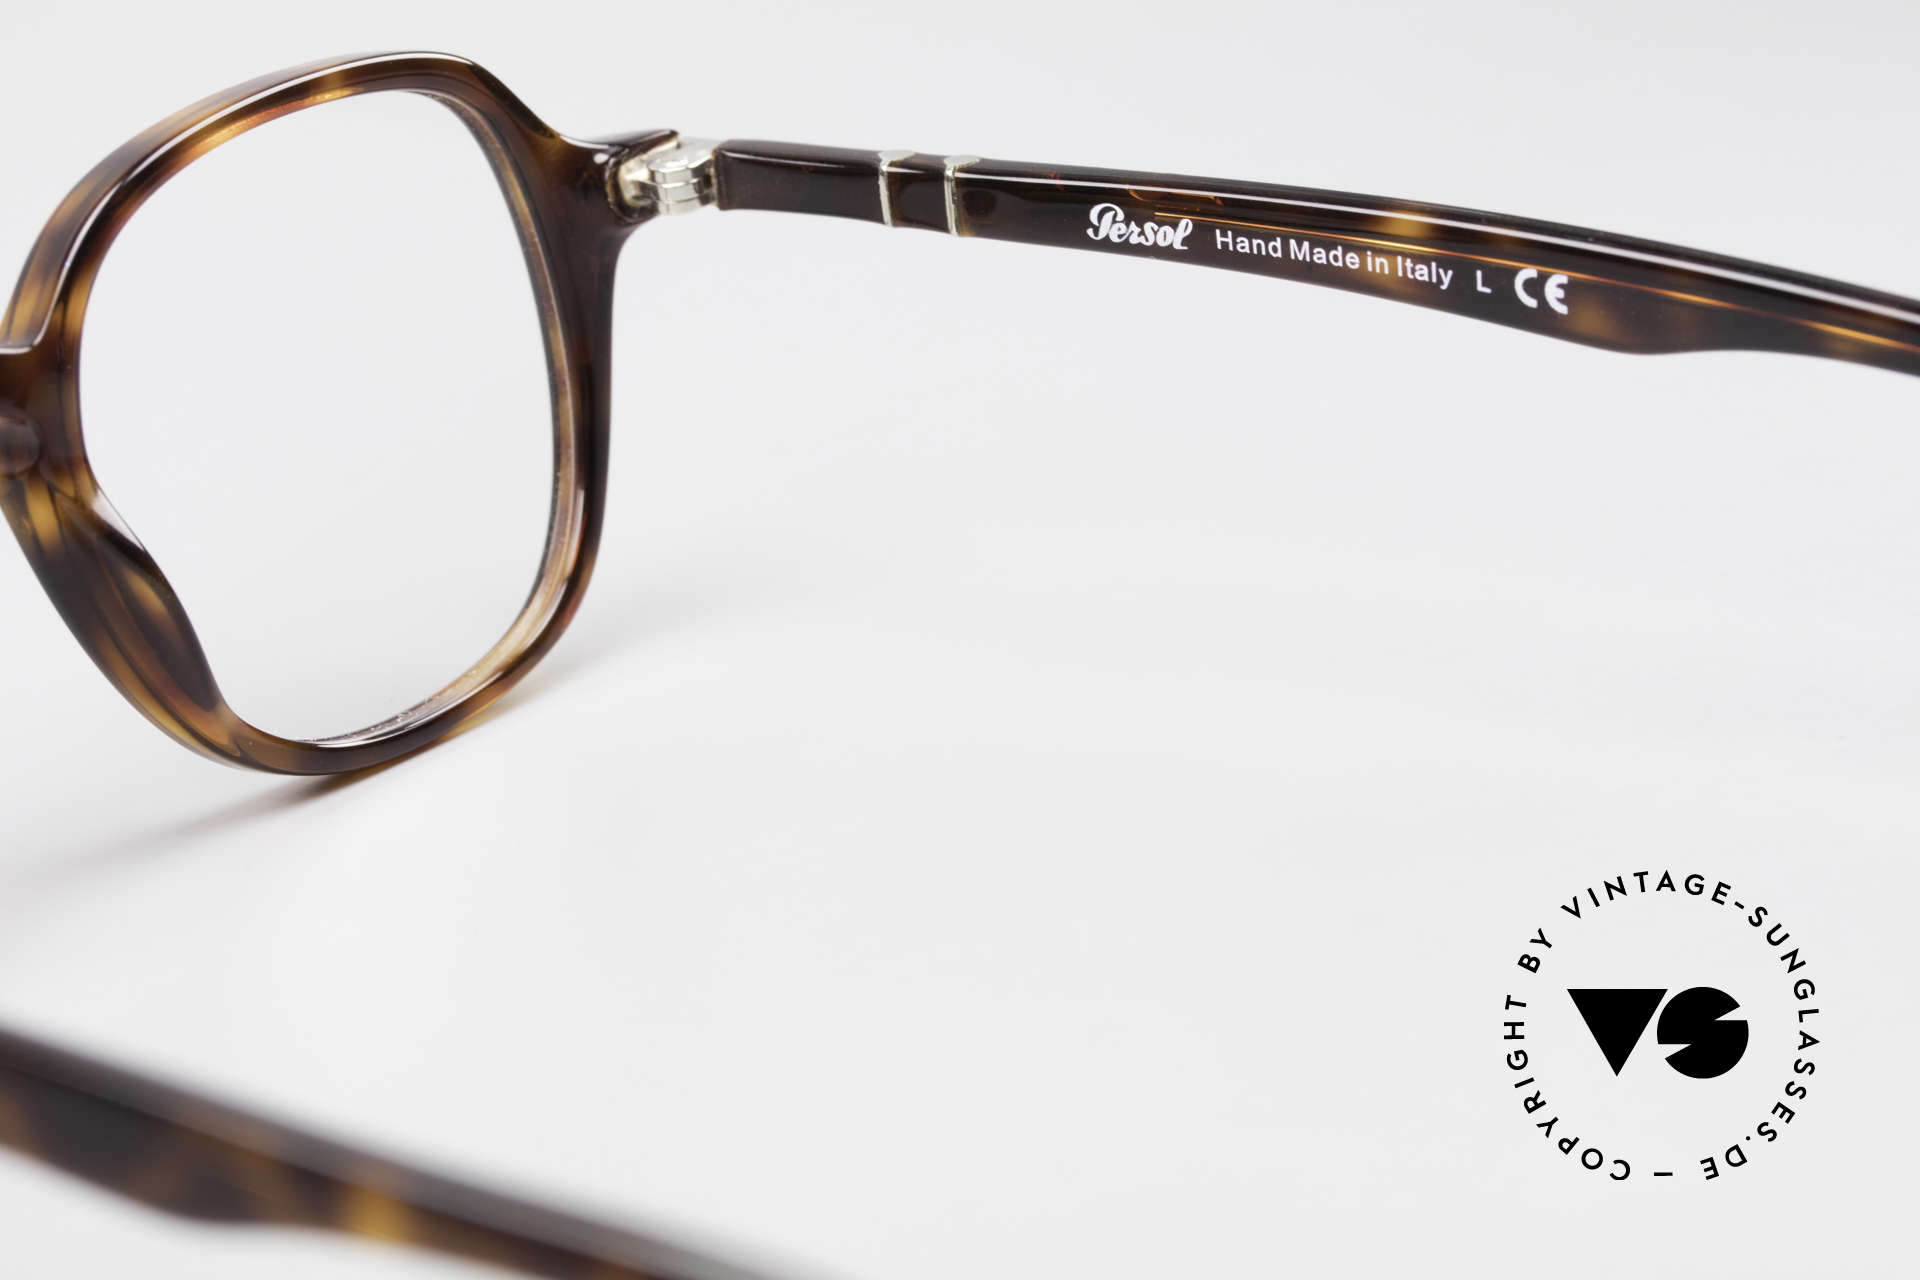 Persol 3142 Square Panto Eyeglasses Unisex, unisex model = suitable for ladies & gentlemen, Made for Men and Women